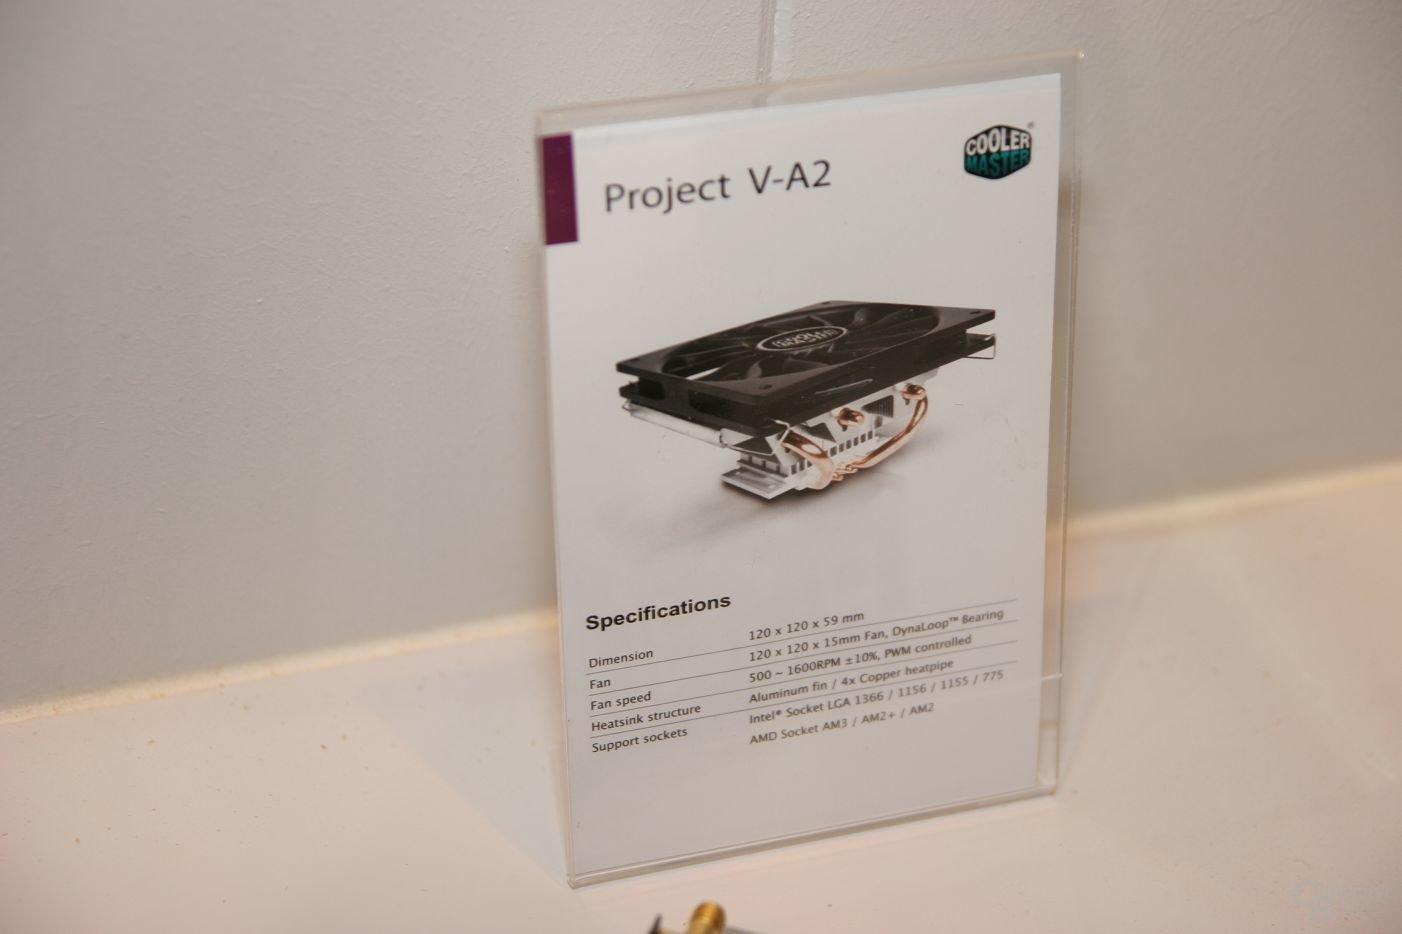 Cooler Master Project V-A2